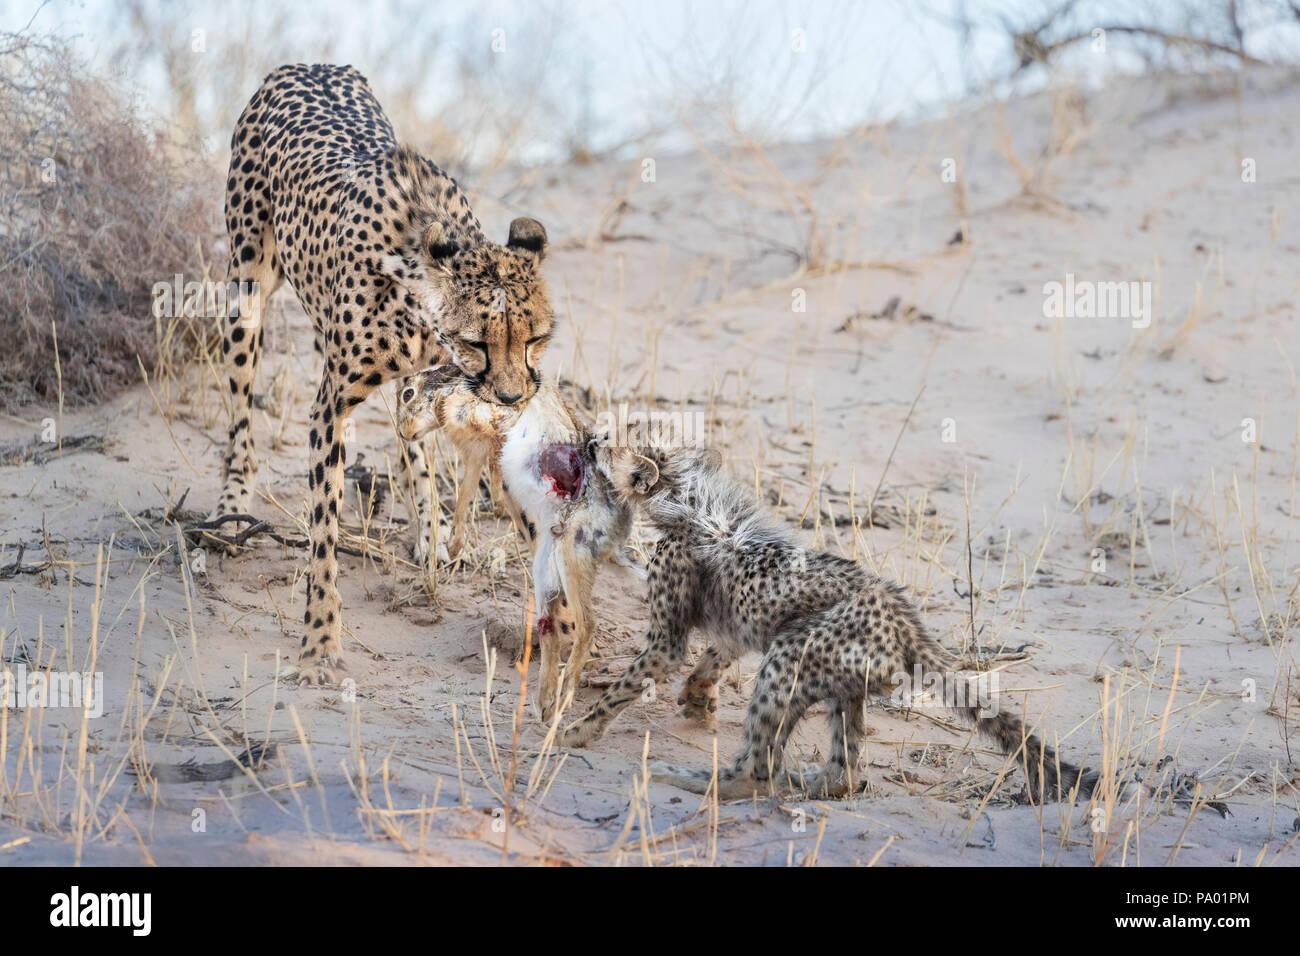 Cheetah (Acinonyx jubatus) and cub feeding on scrub hare (Lepus saxatilis), Kgalagadi transfrontier park, South Africa Stock Photo